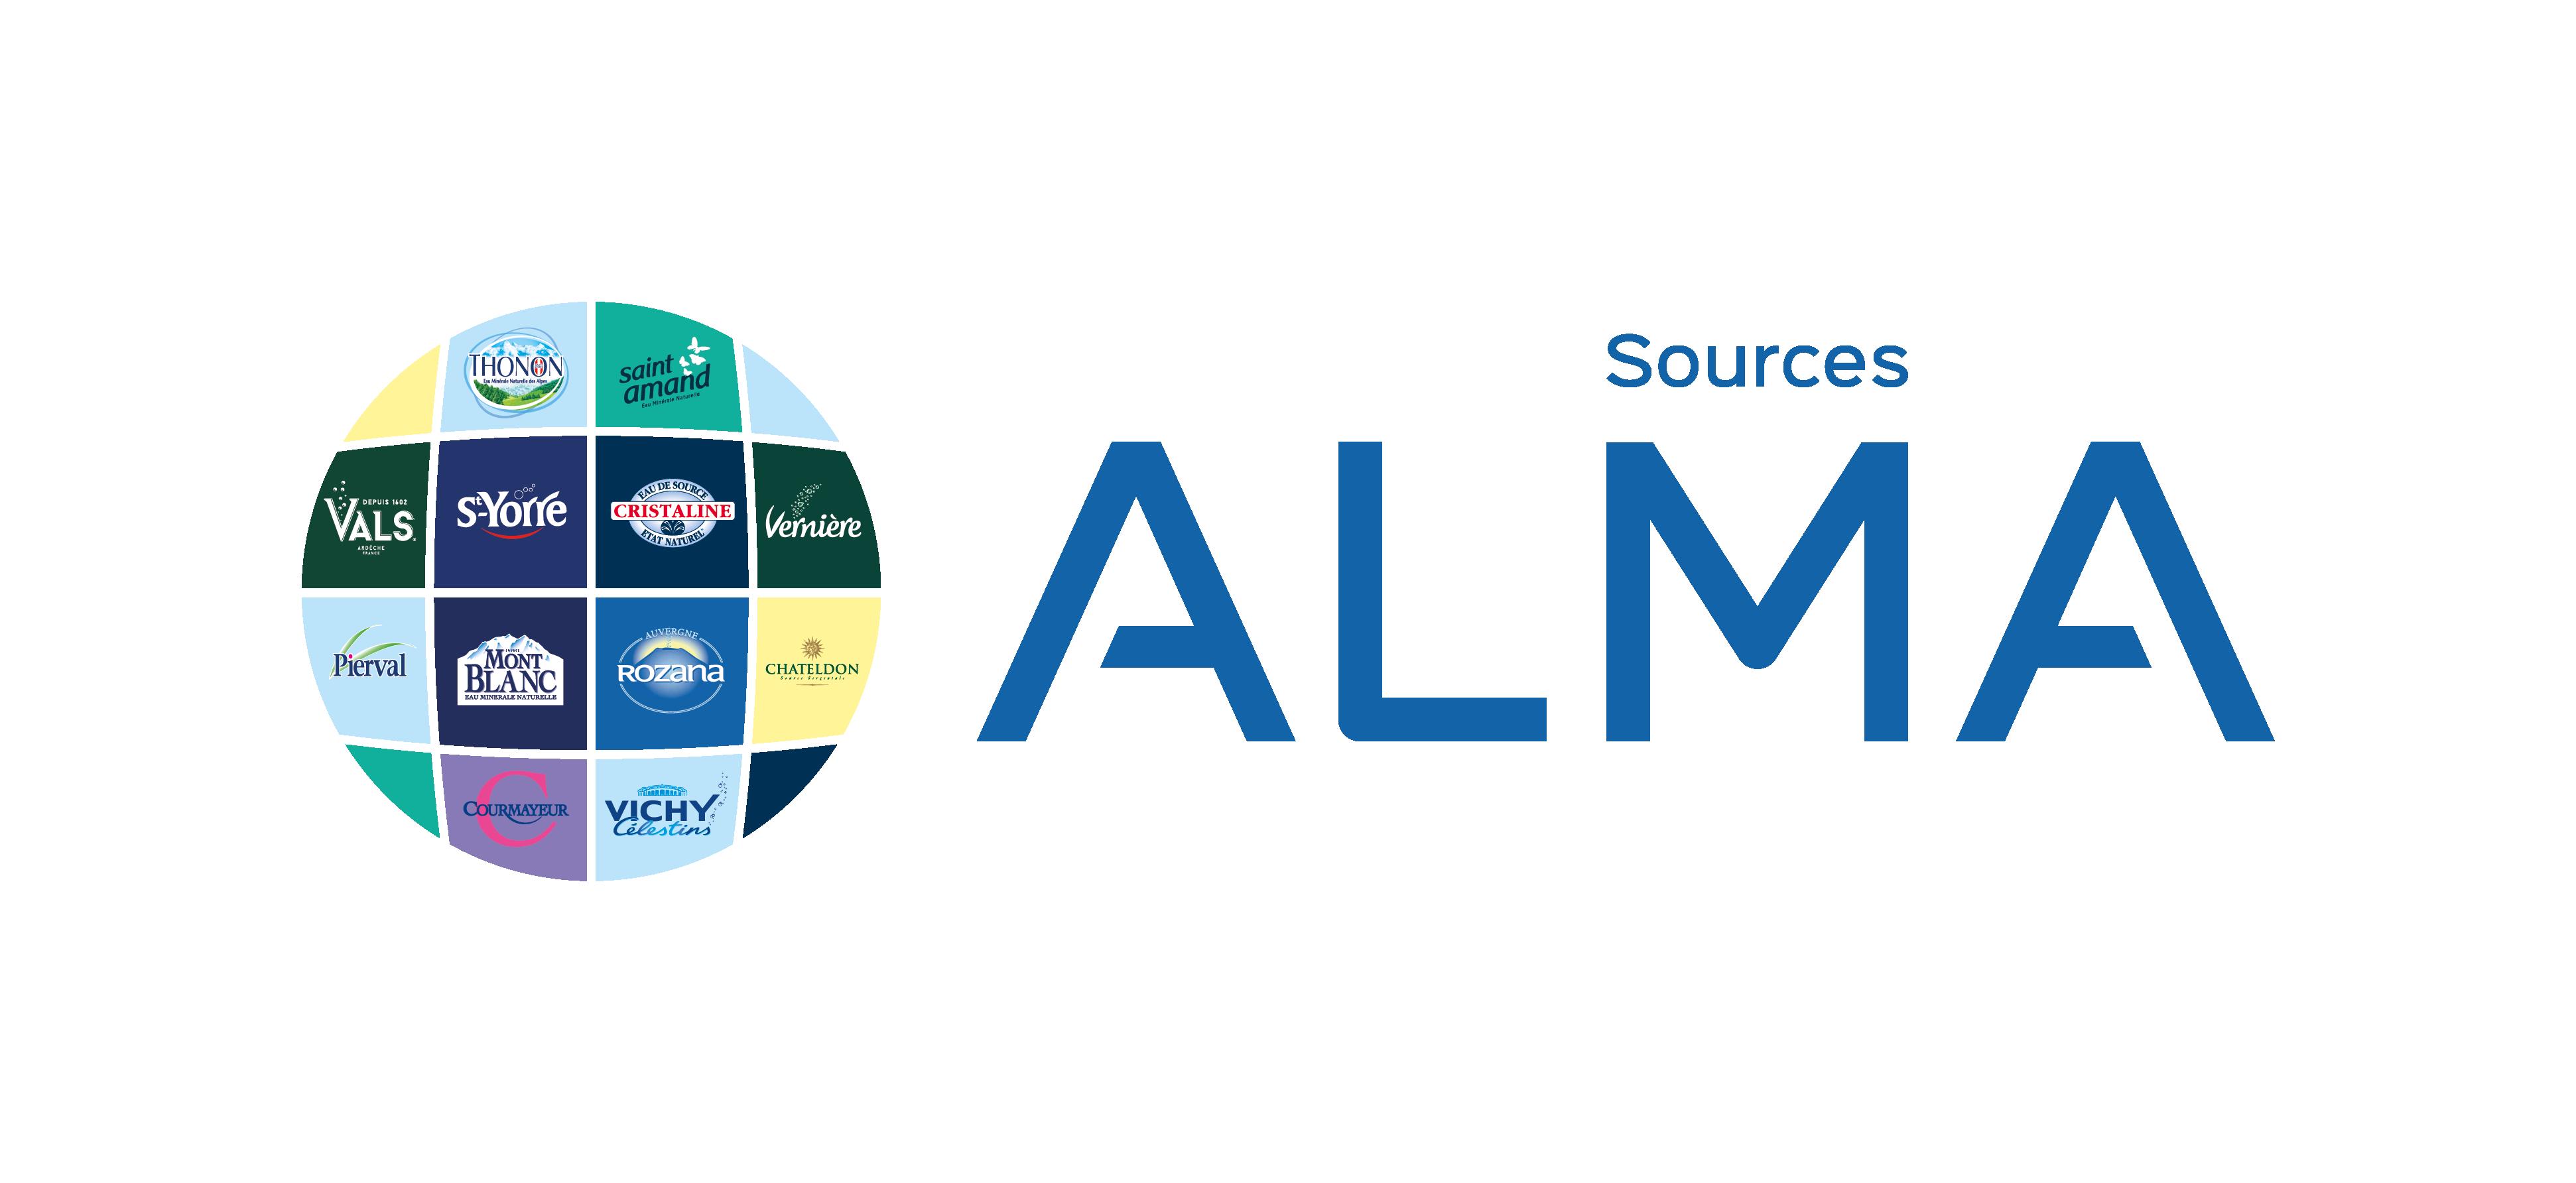 https://europeanplasticspact.org/wp-content/uploads/2020/03/ALMA-SA.png